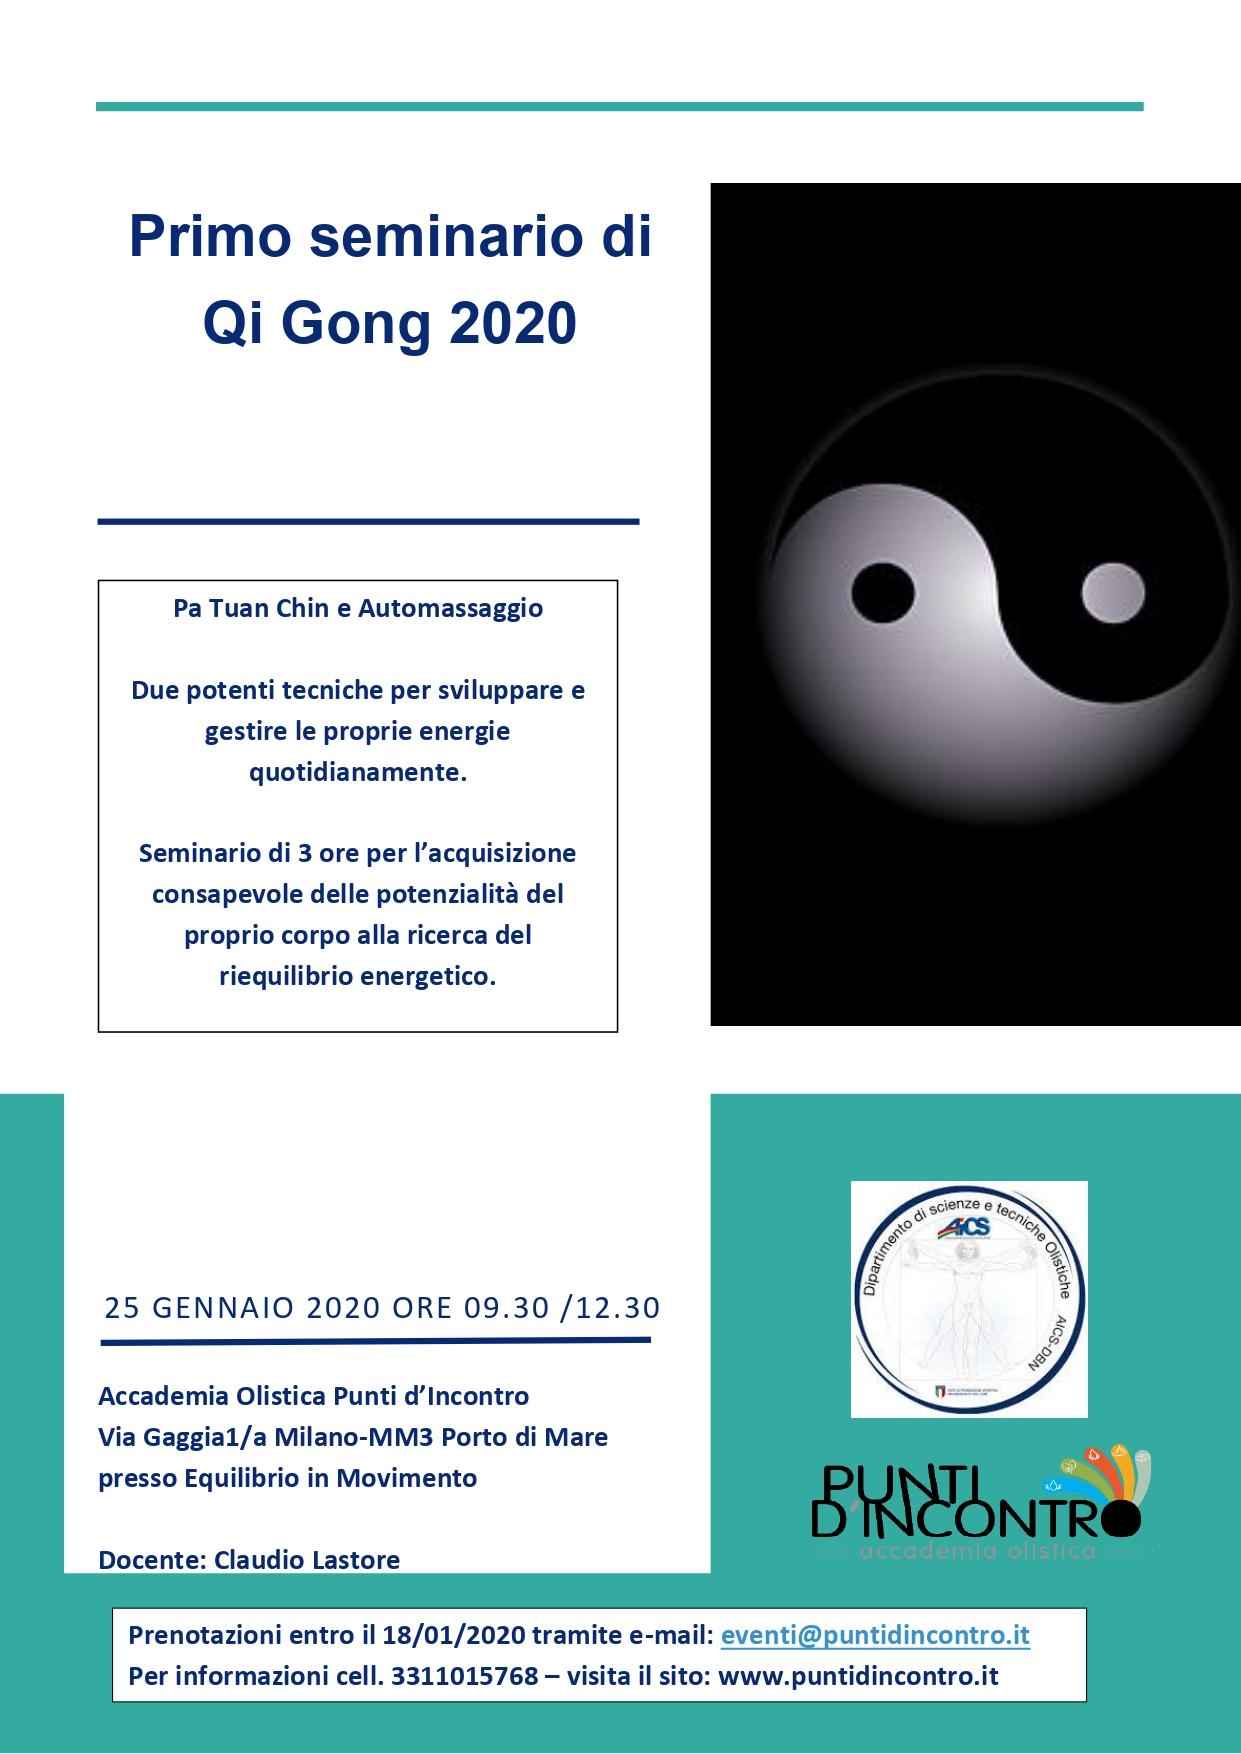 Primo seminario 2020 di Qi Gong